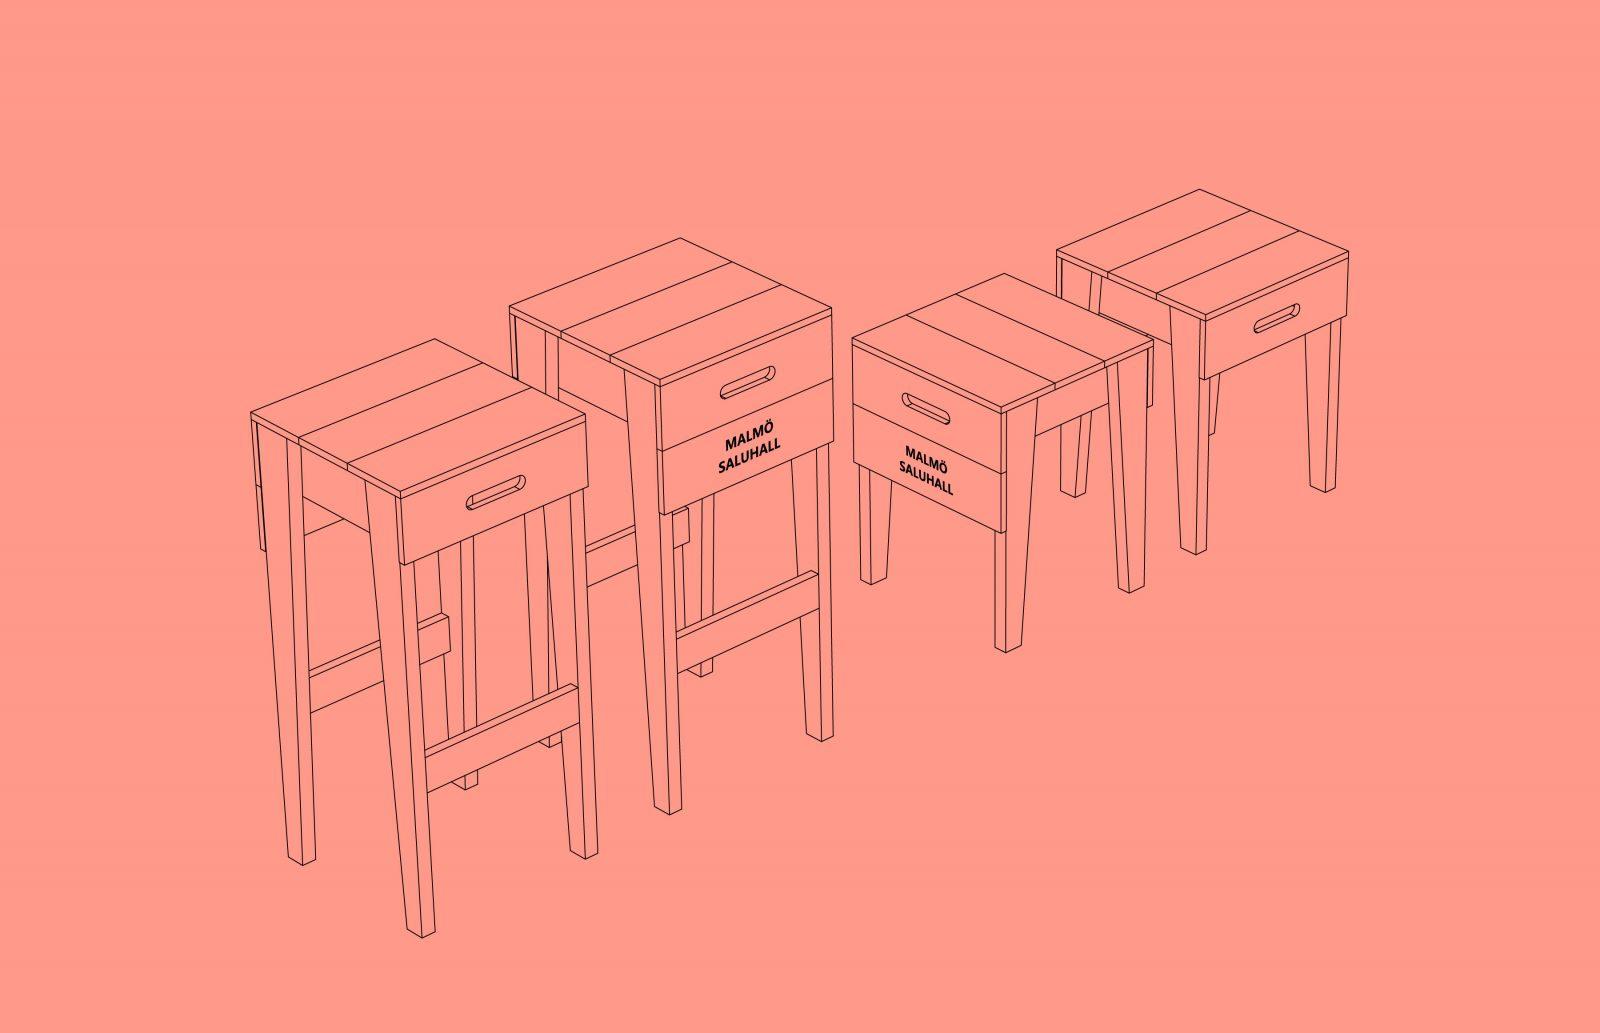 KjellanderSjoberg Malmö Saluhall Axo-chairs 3600x2324px